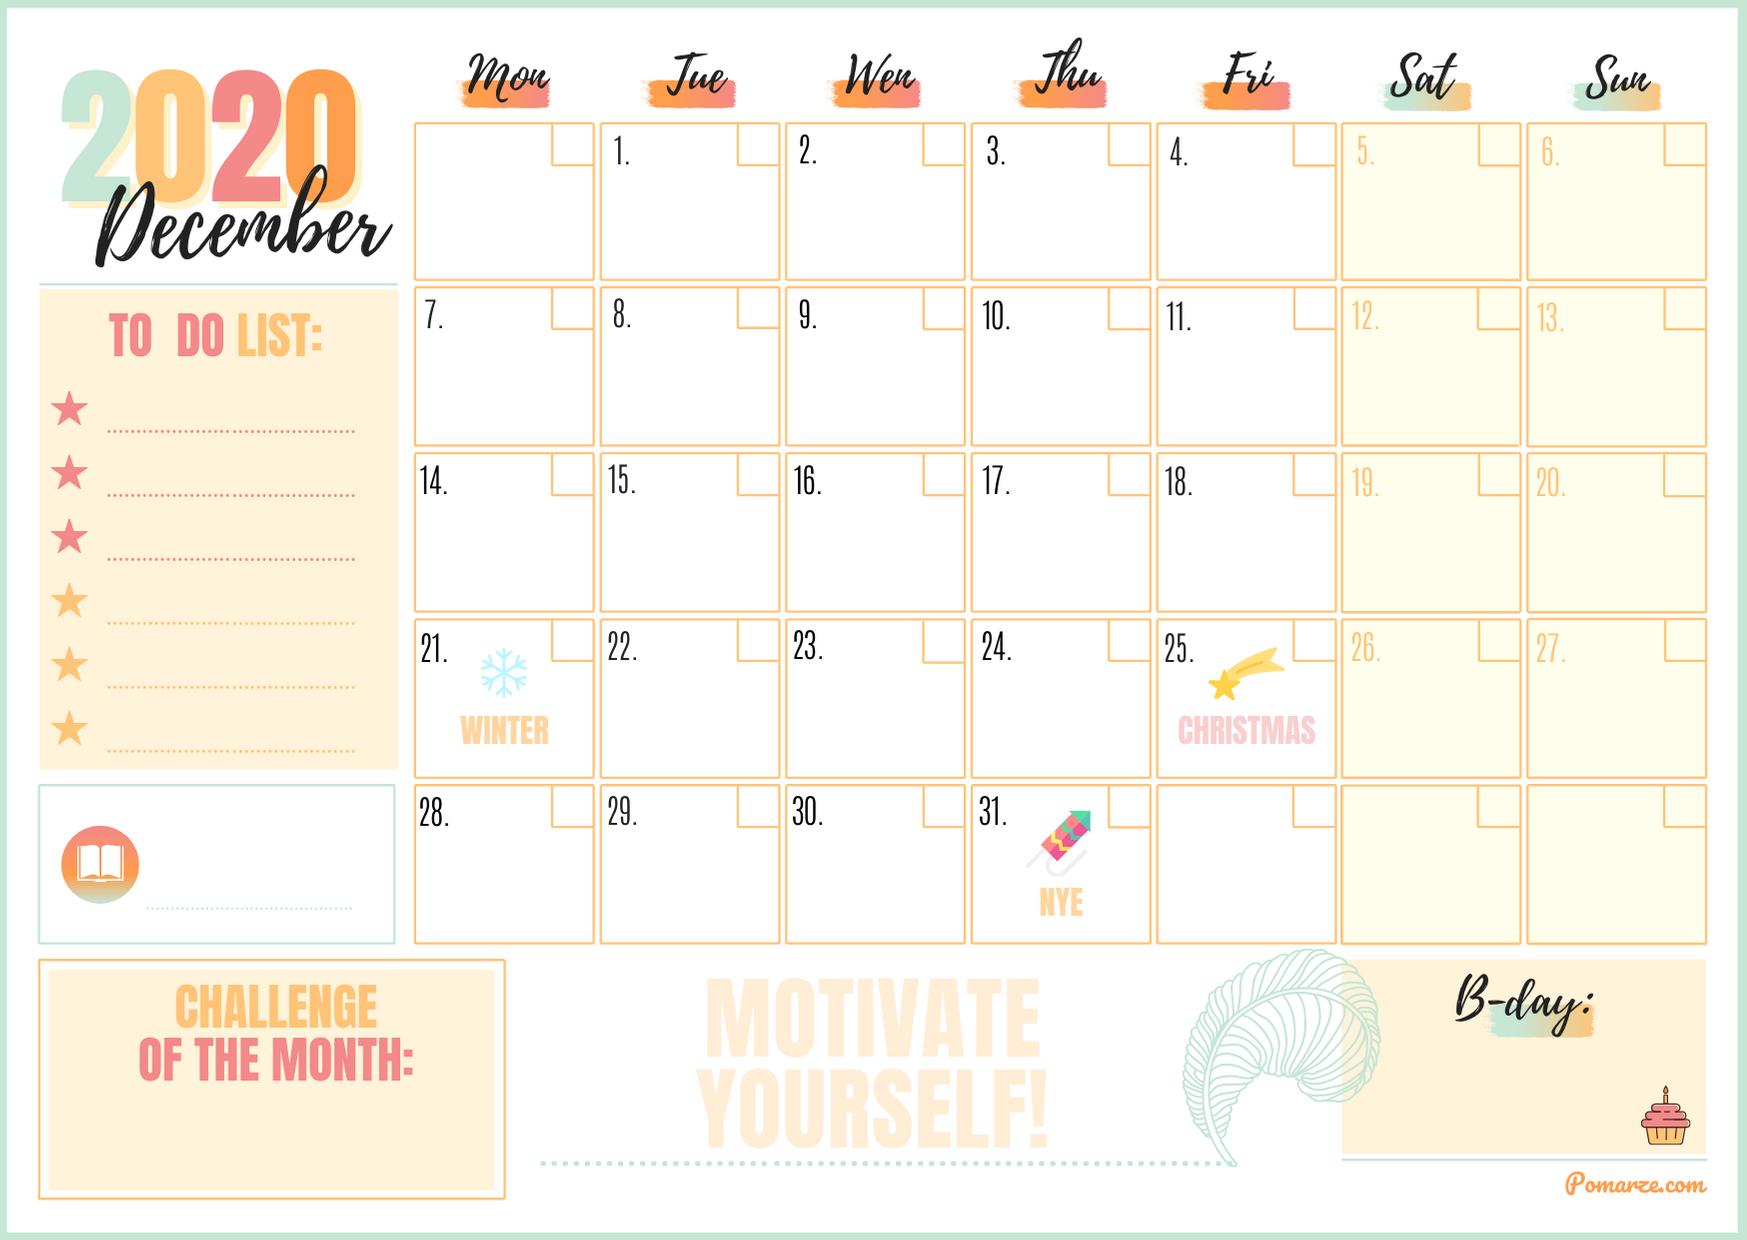 Monthly calendar planner December 2020 colour